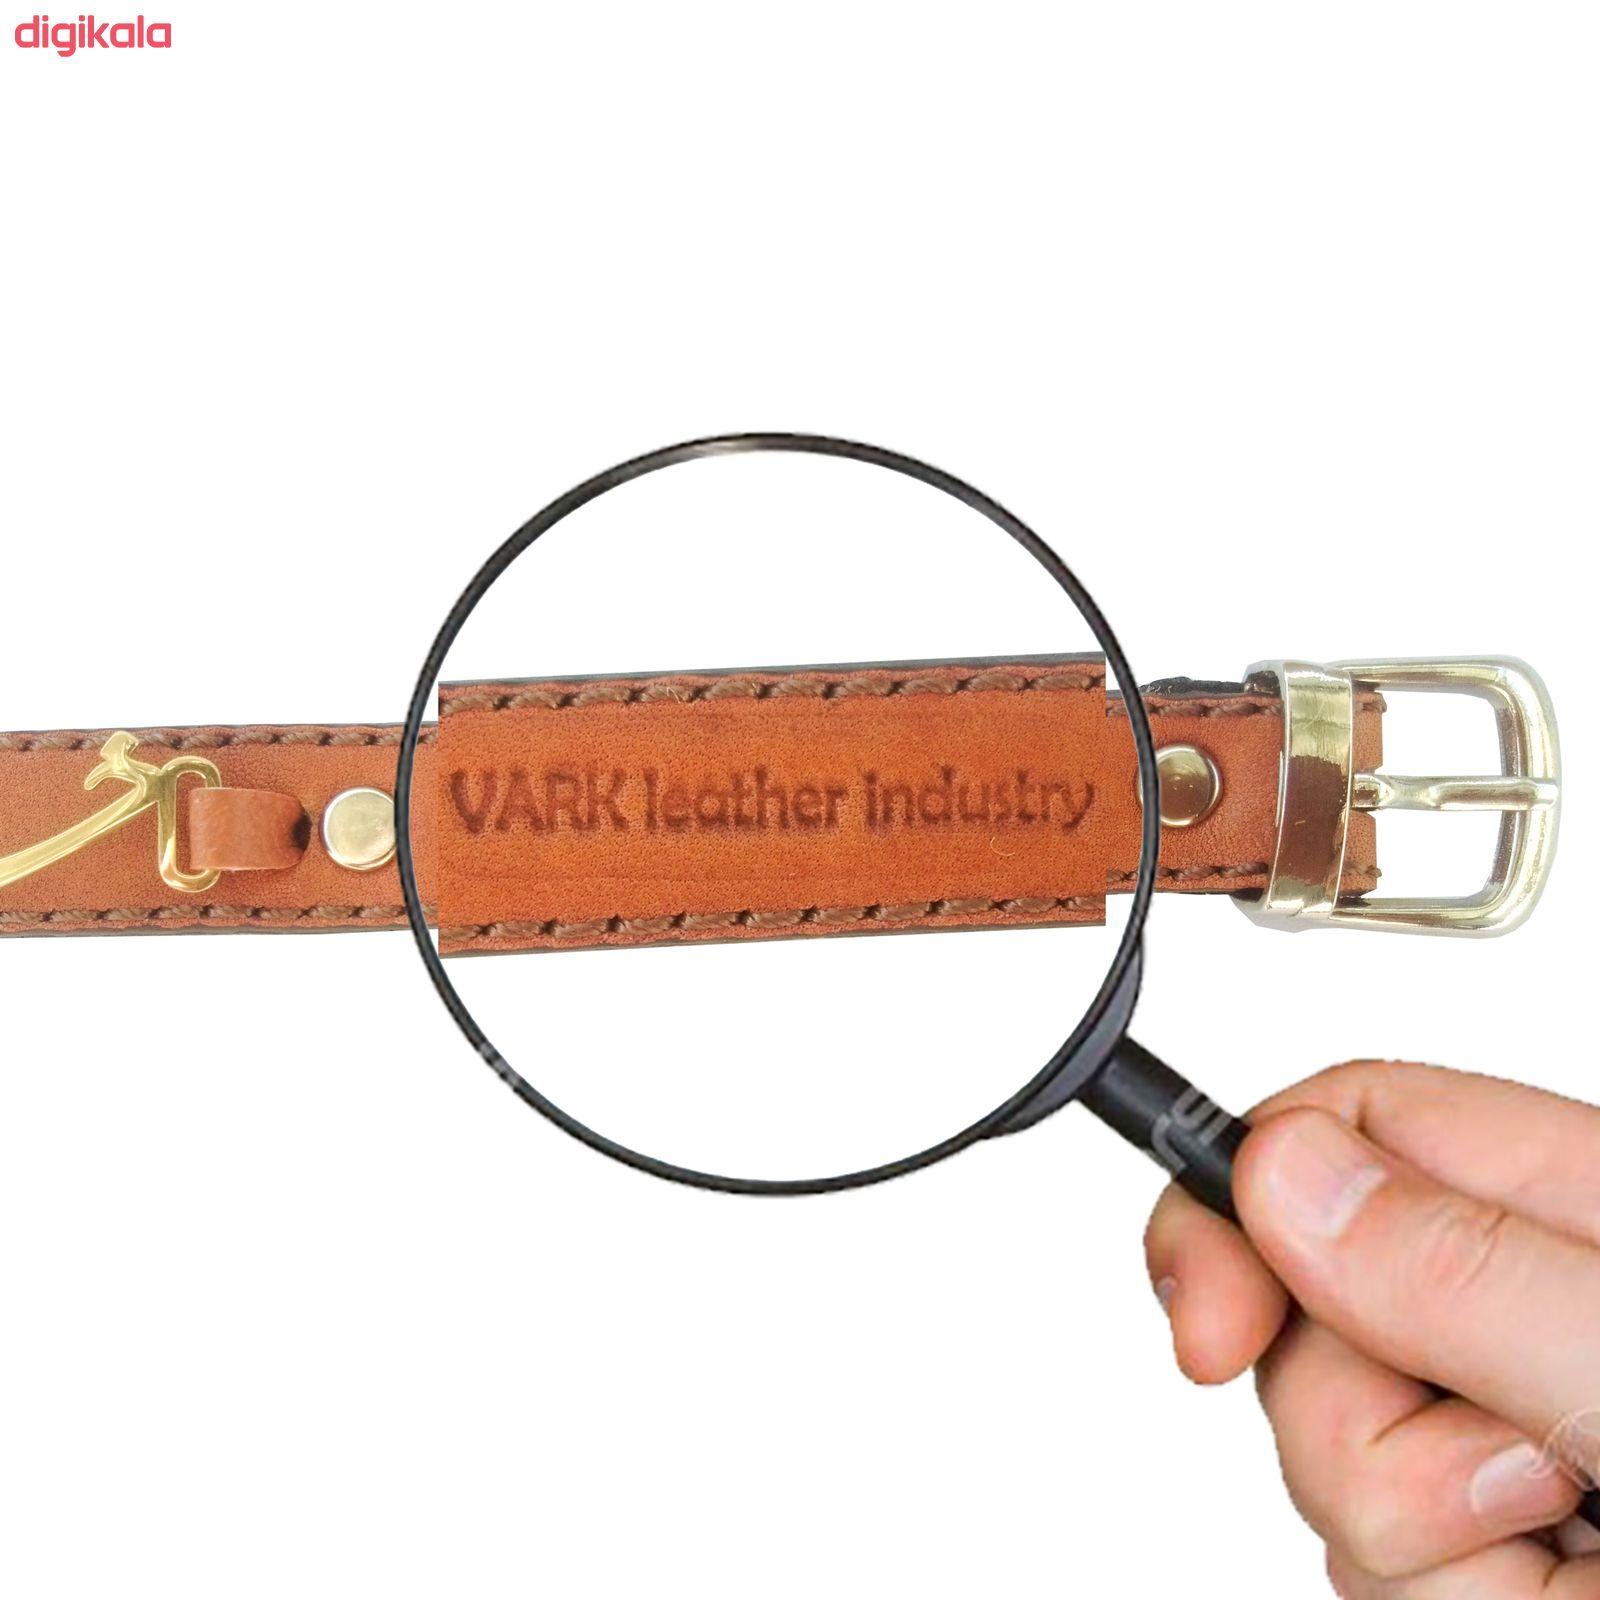 دستبند چرم وارک طرح خدا مدل پرهام کد rb50 main 1 10